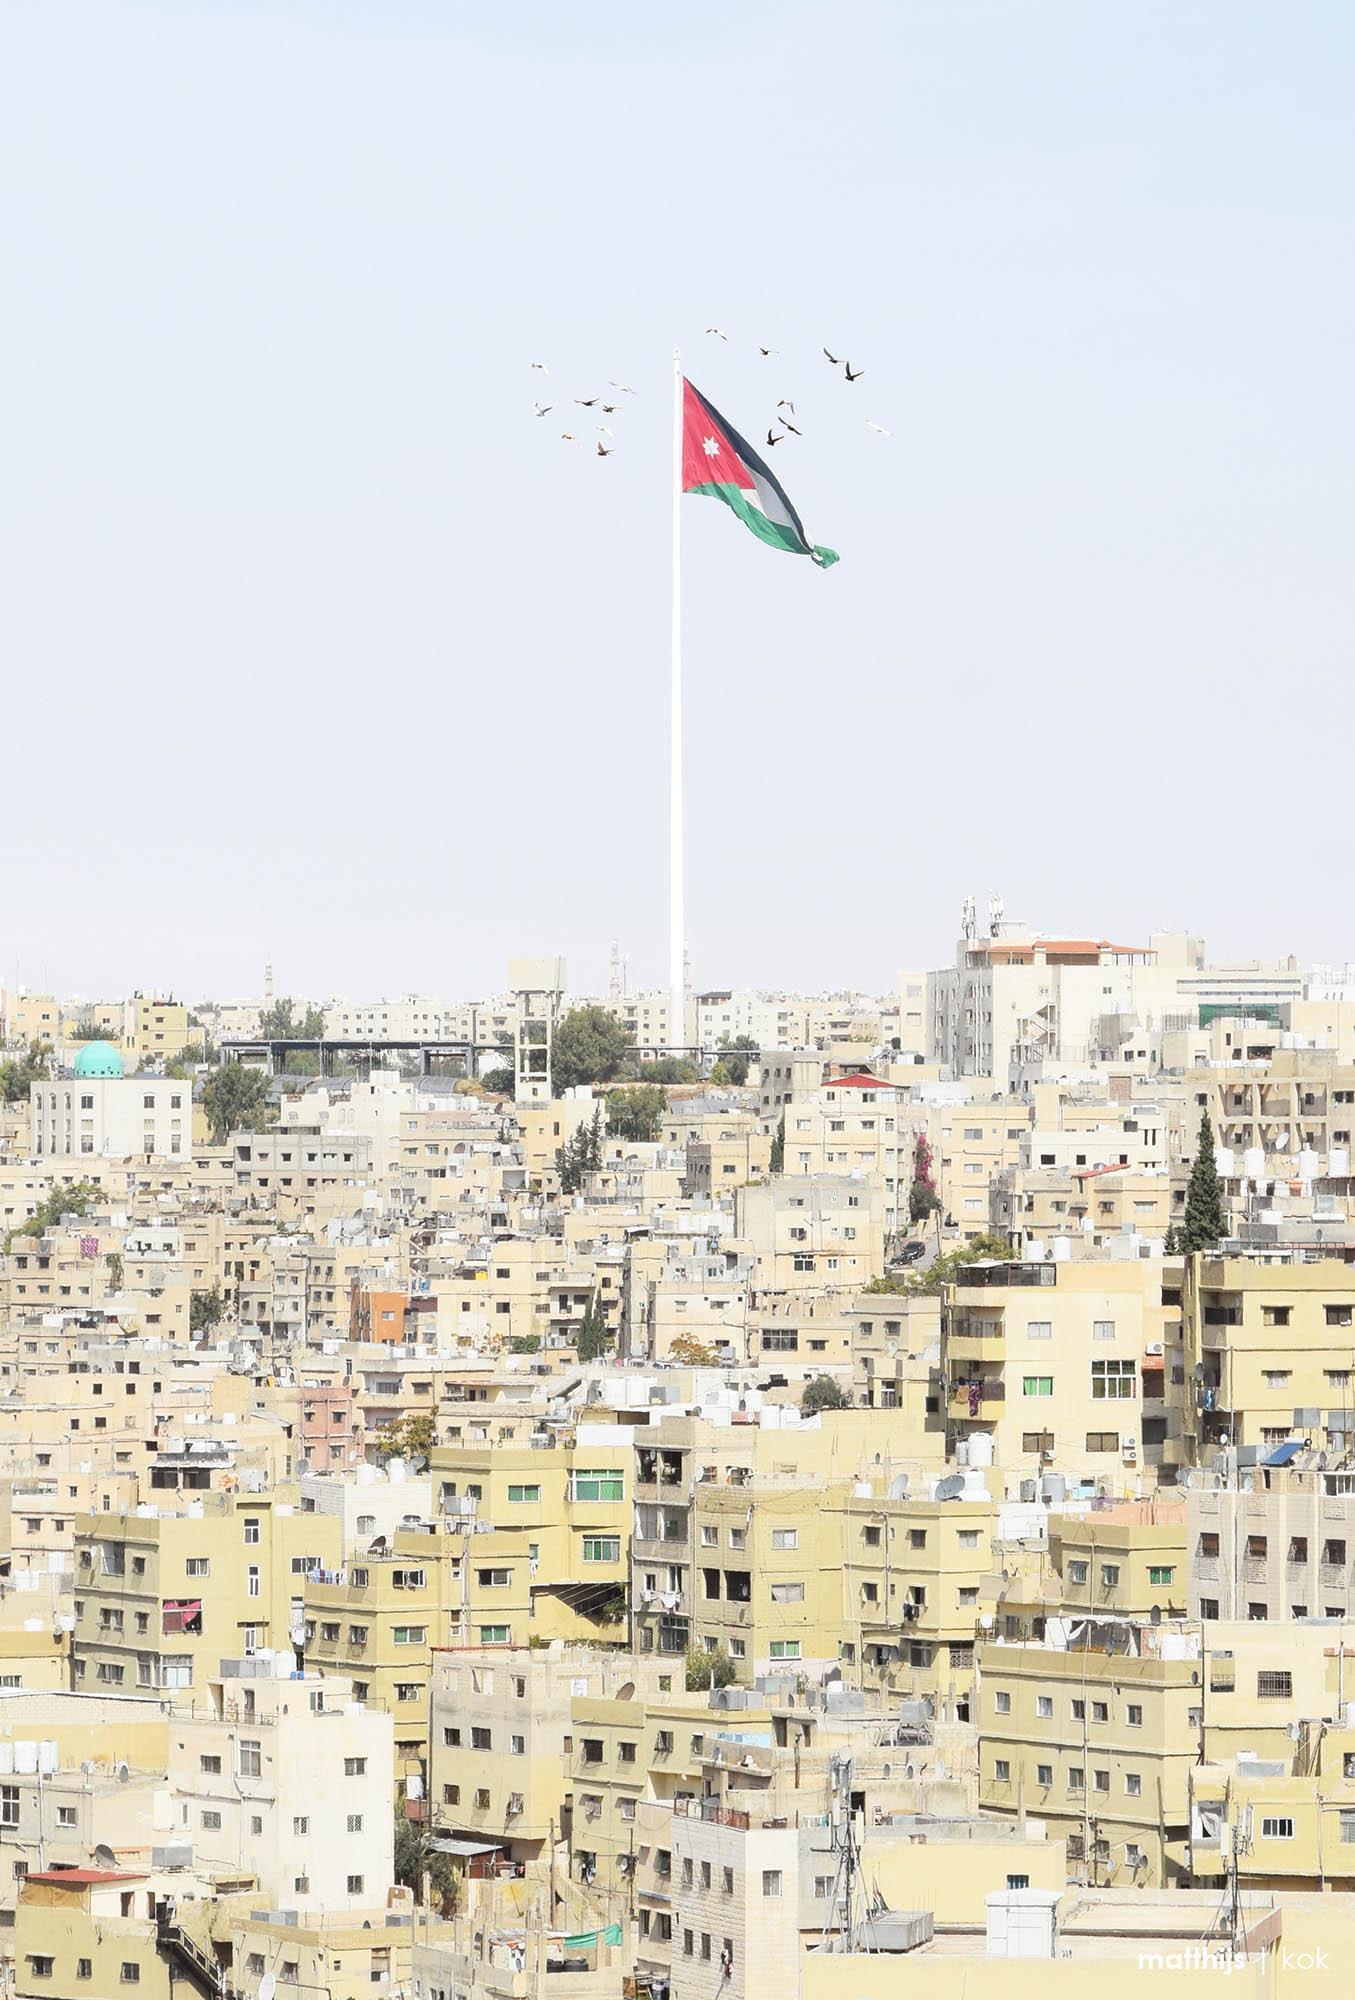 Amman, Jordan | Photo by Matthijs Kok